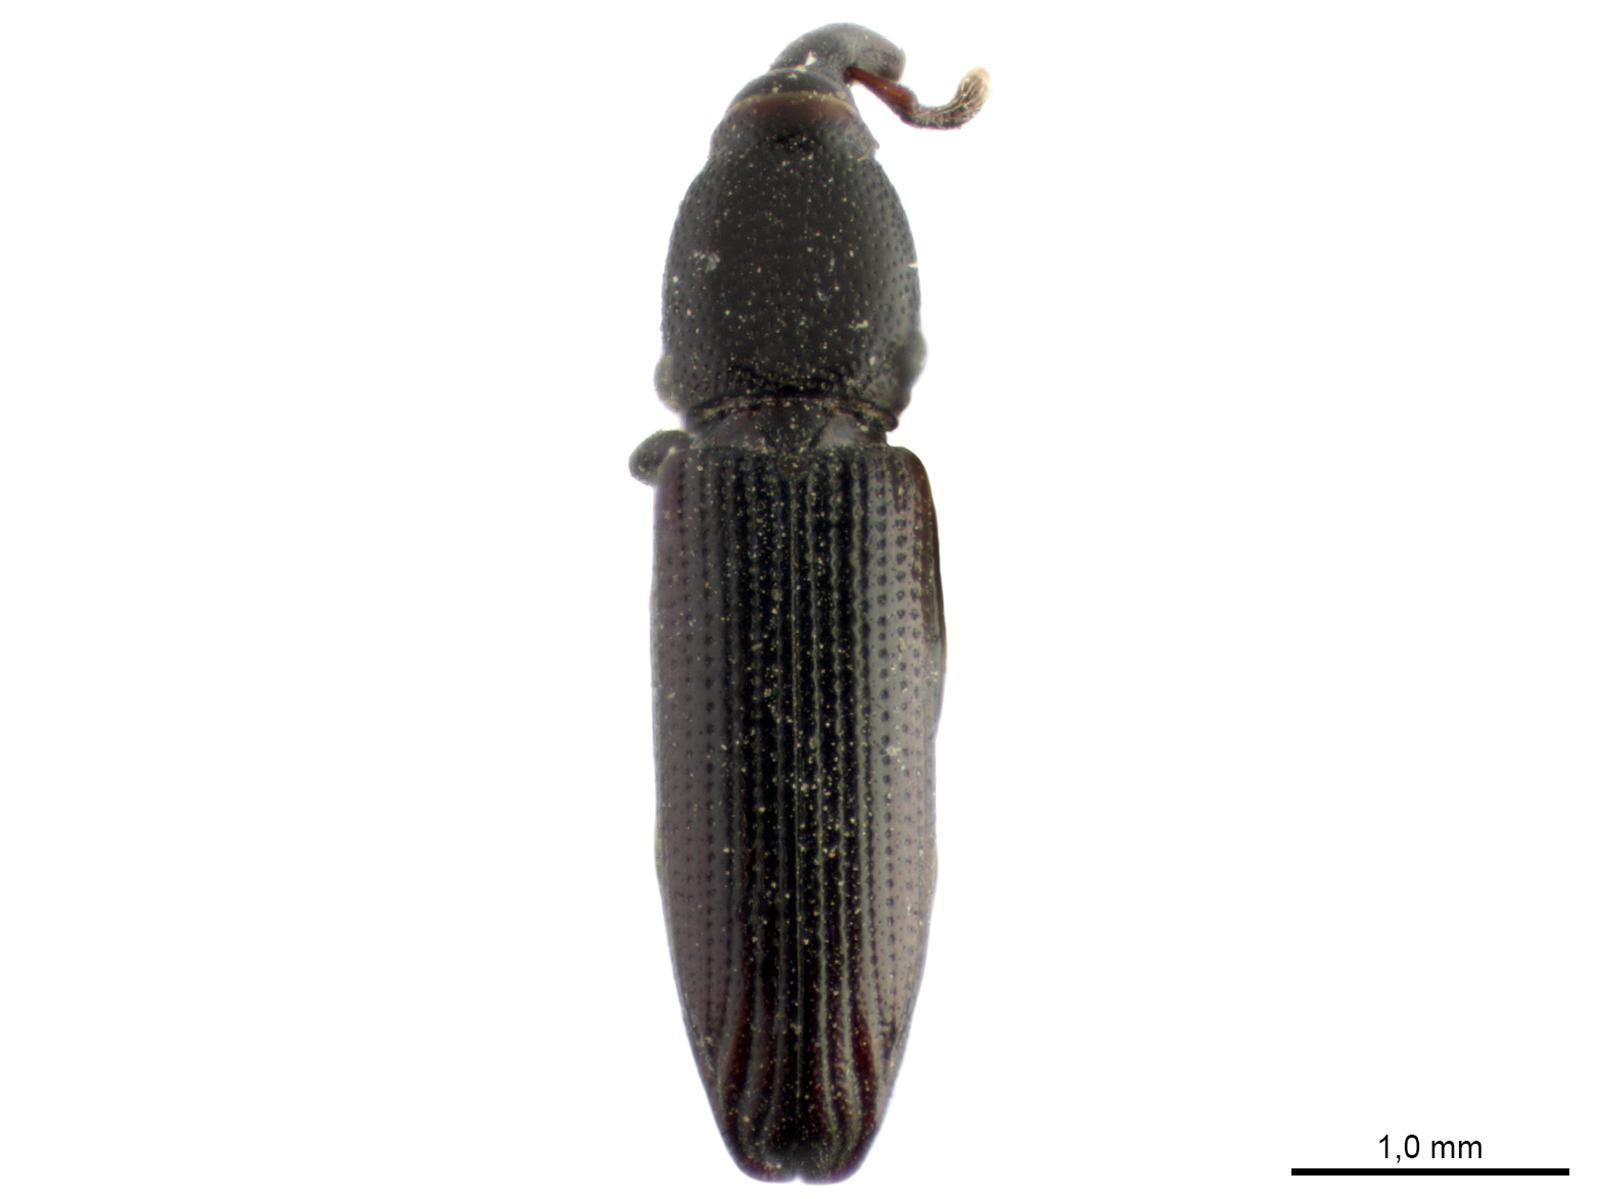 Catolethrus longulusBoheman, 1838